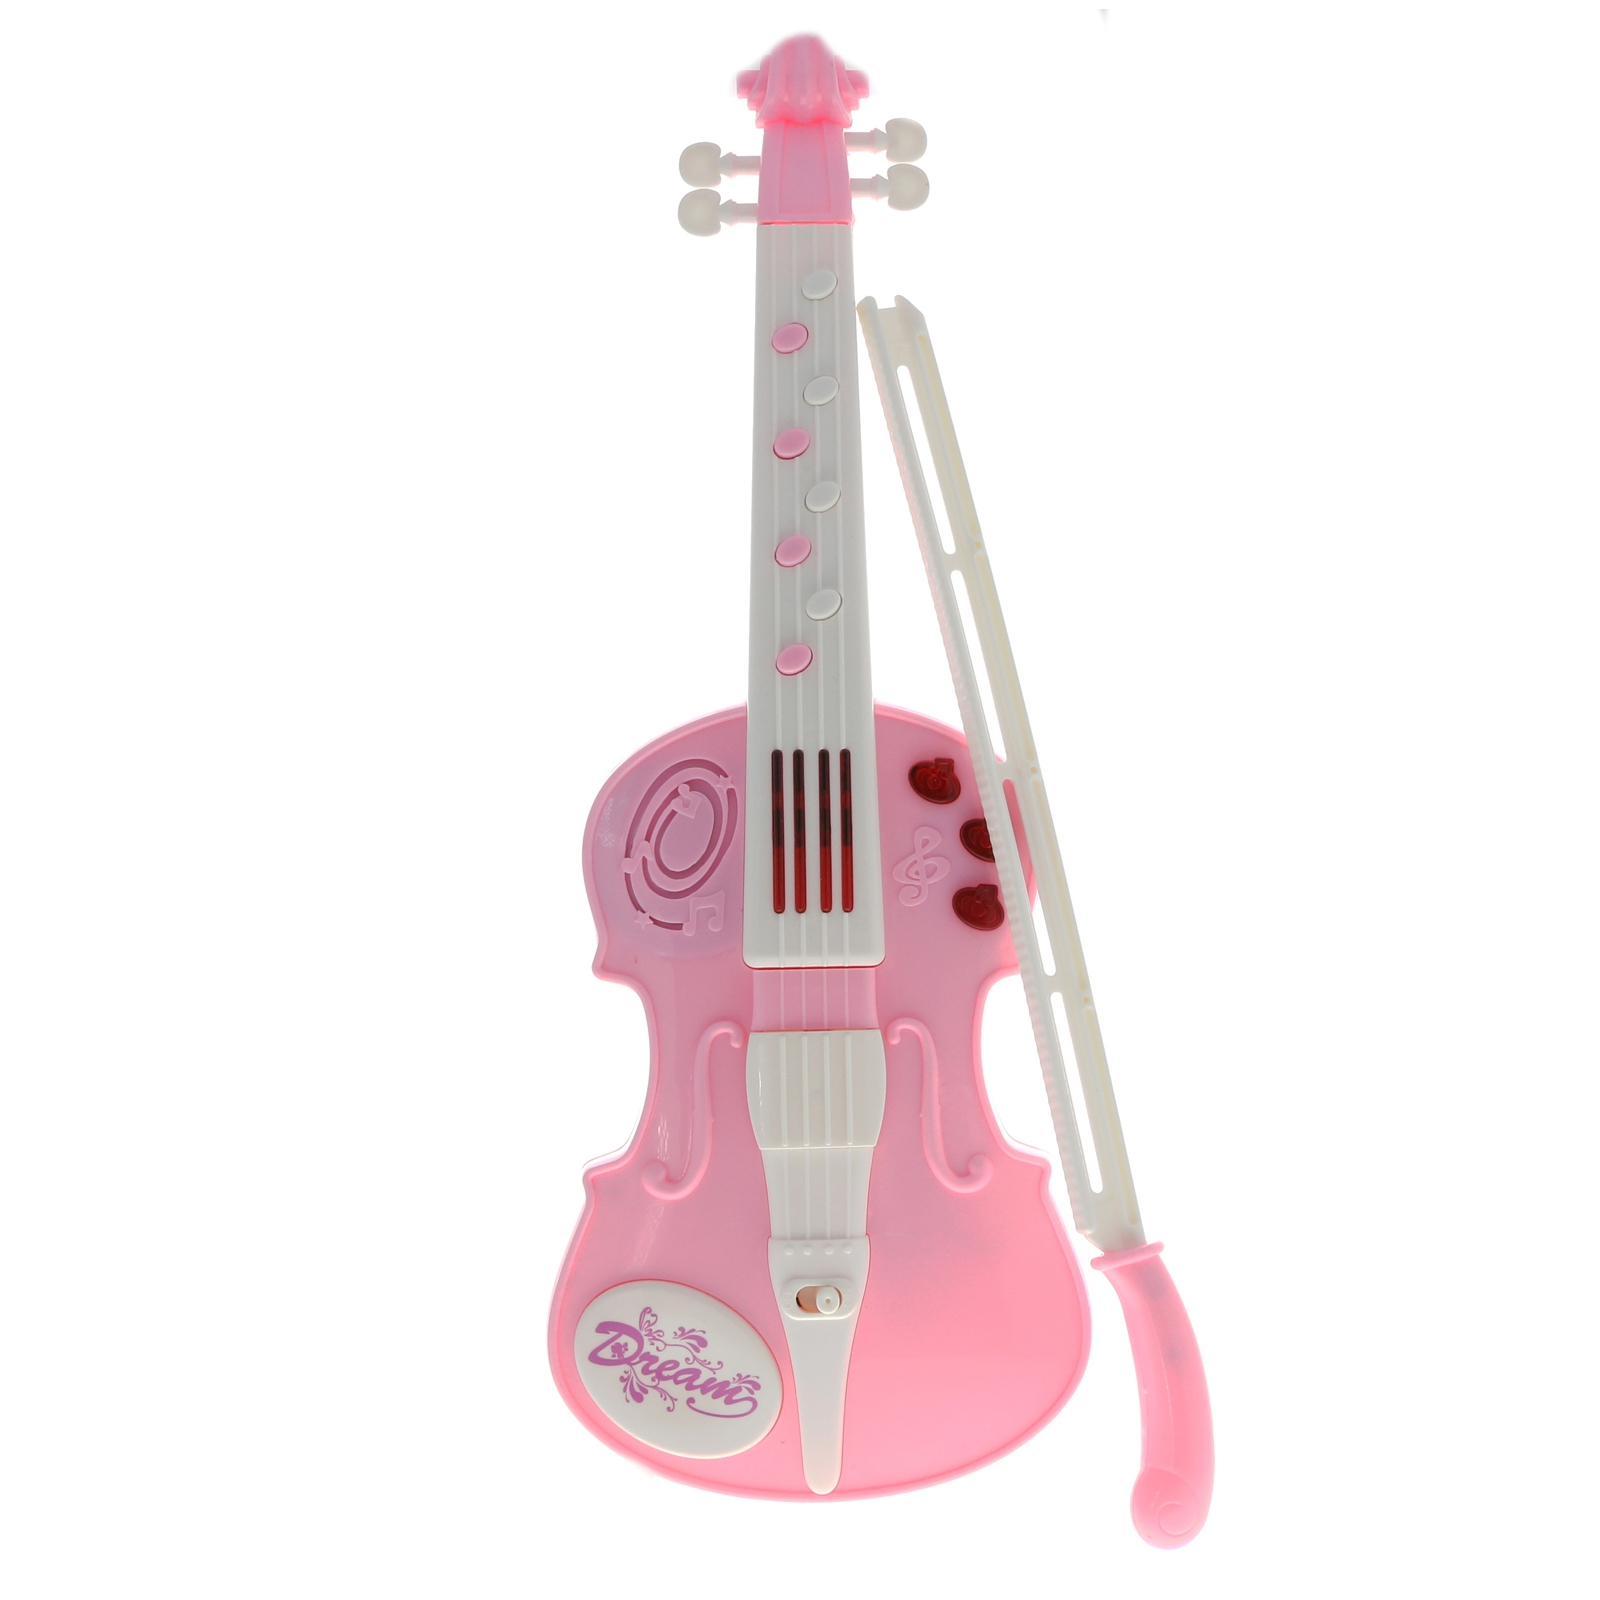 KidPlay Girls Musical Violin Instrument Pretend Play Kids Light Up Toy - Pink